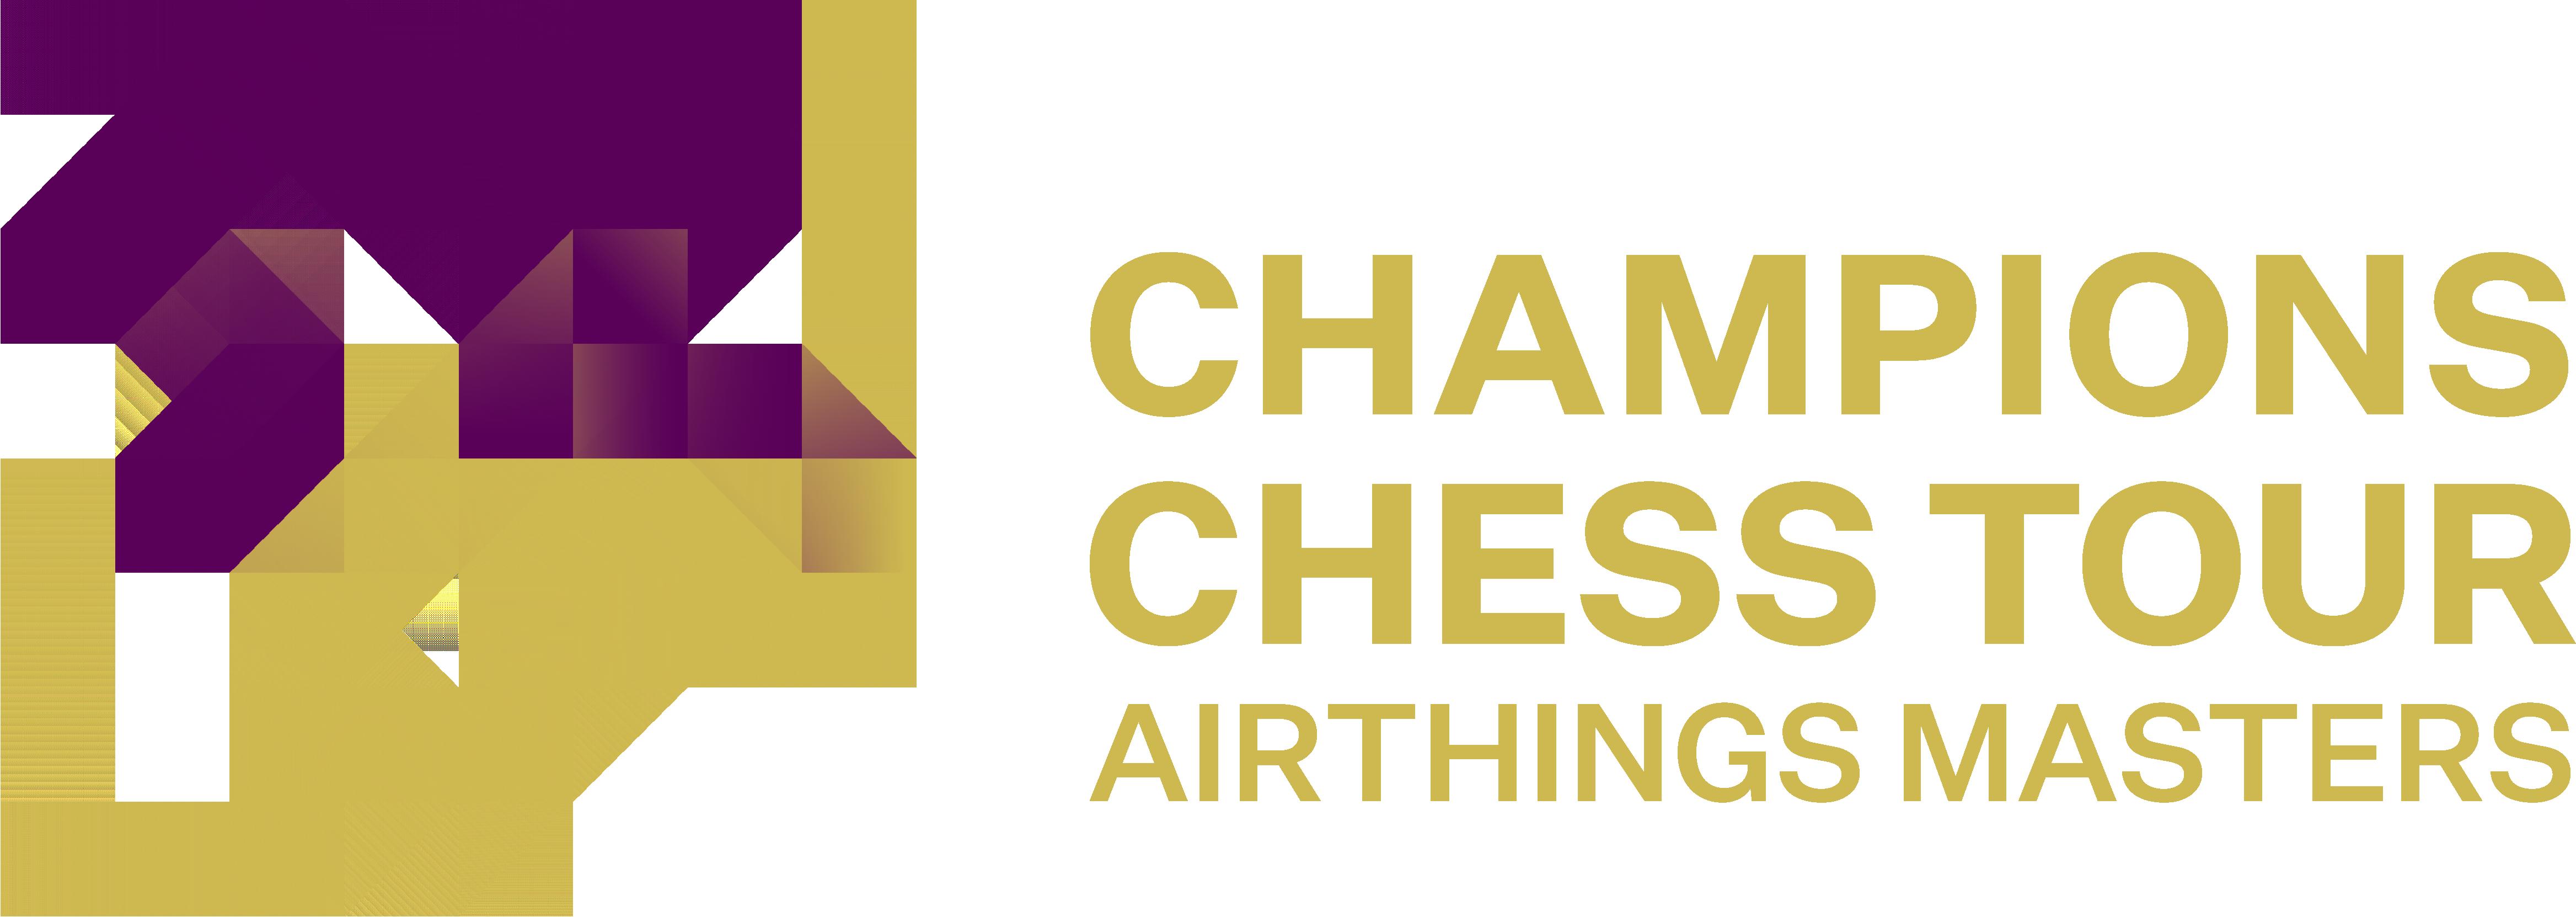 AirthingsMasters_logo